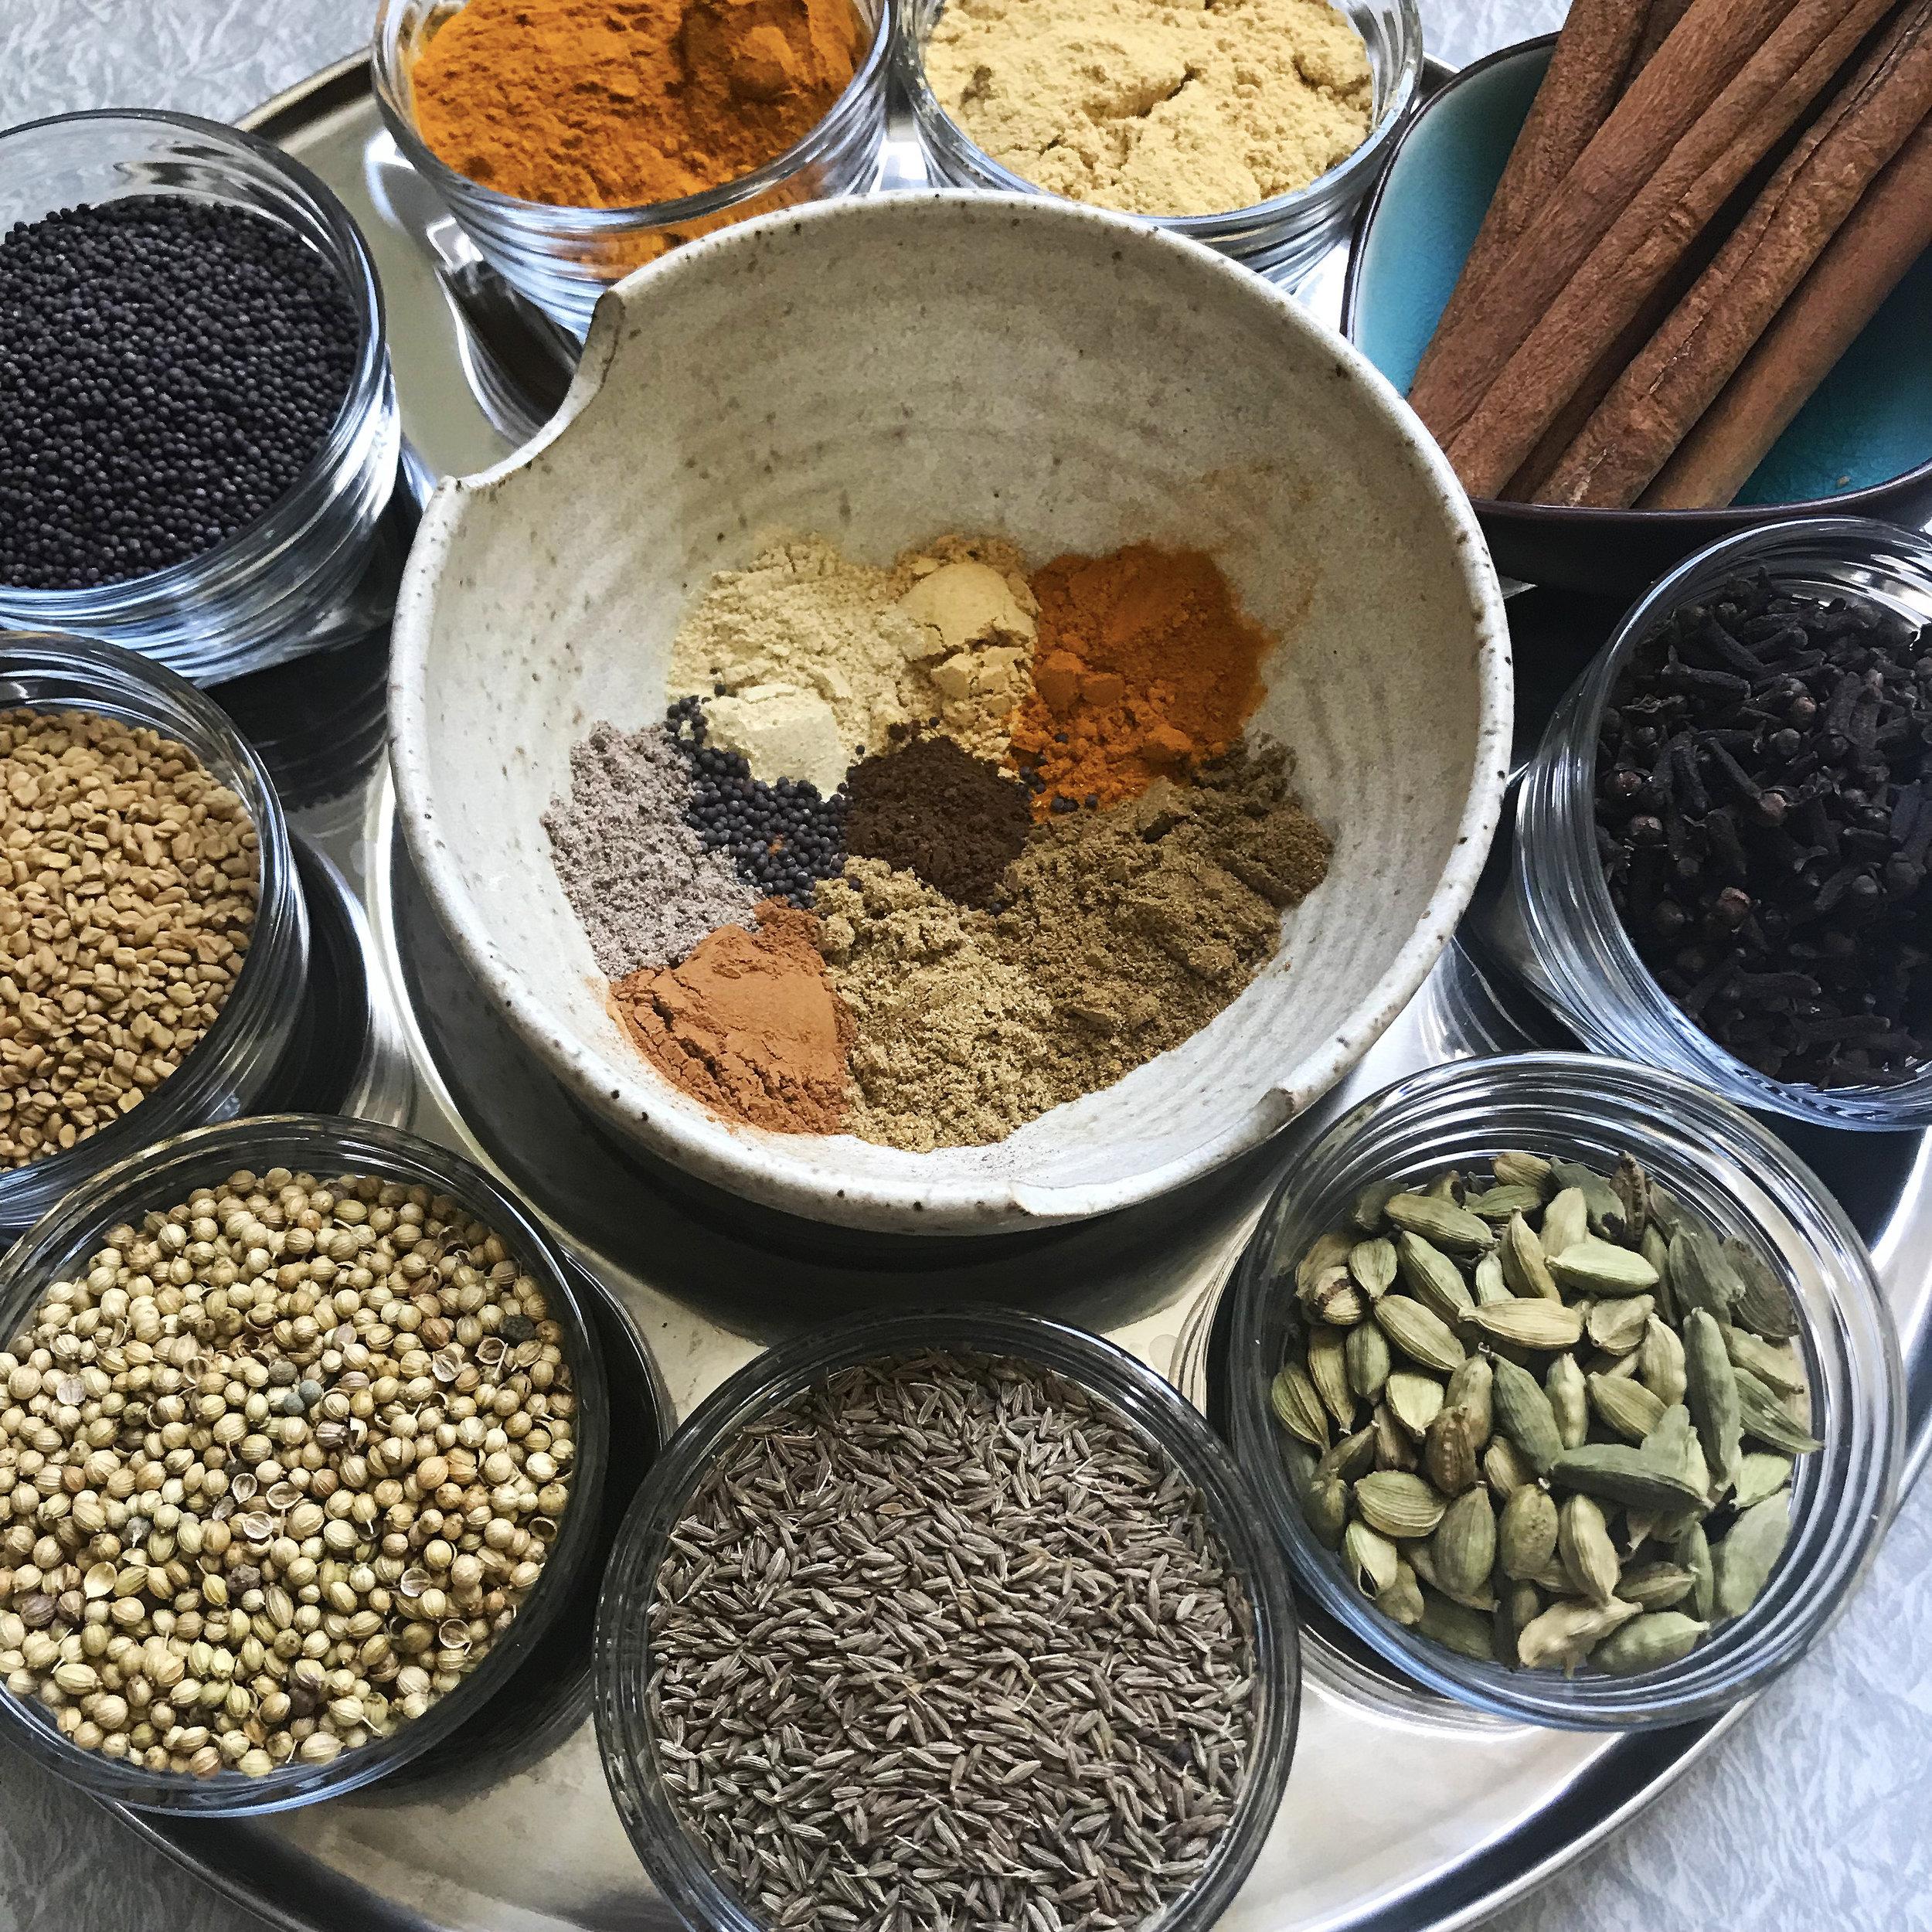 Five-Prana-Ayurveda_Curry-Powder-Spice-Blend.jpg